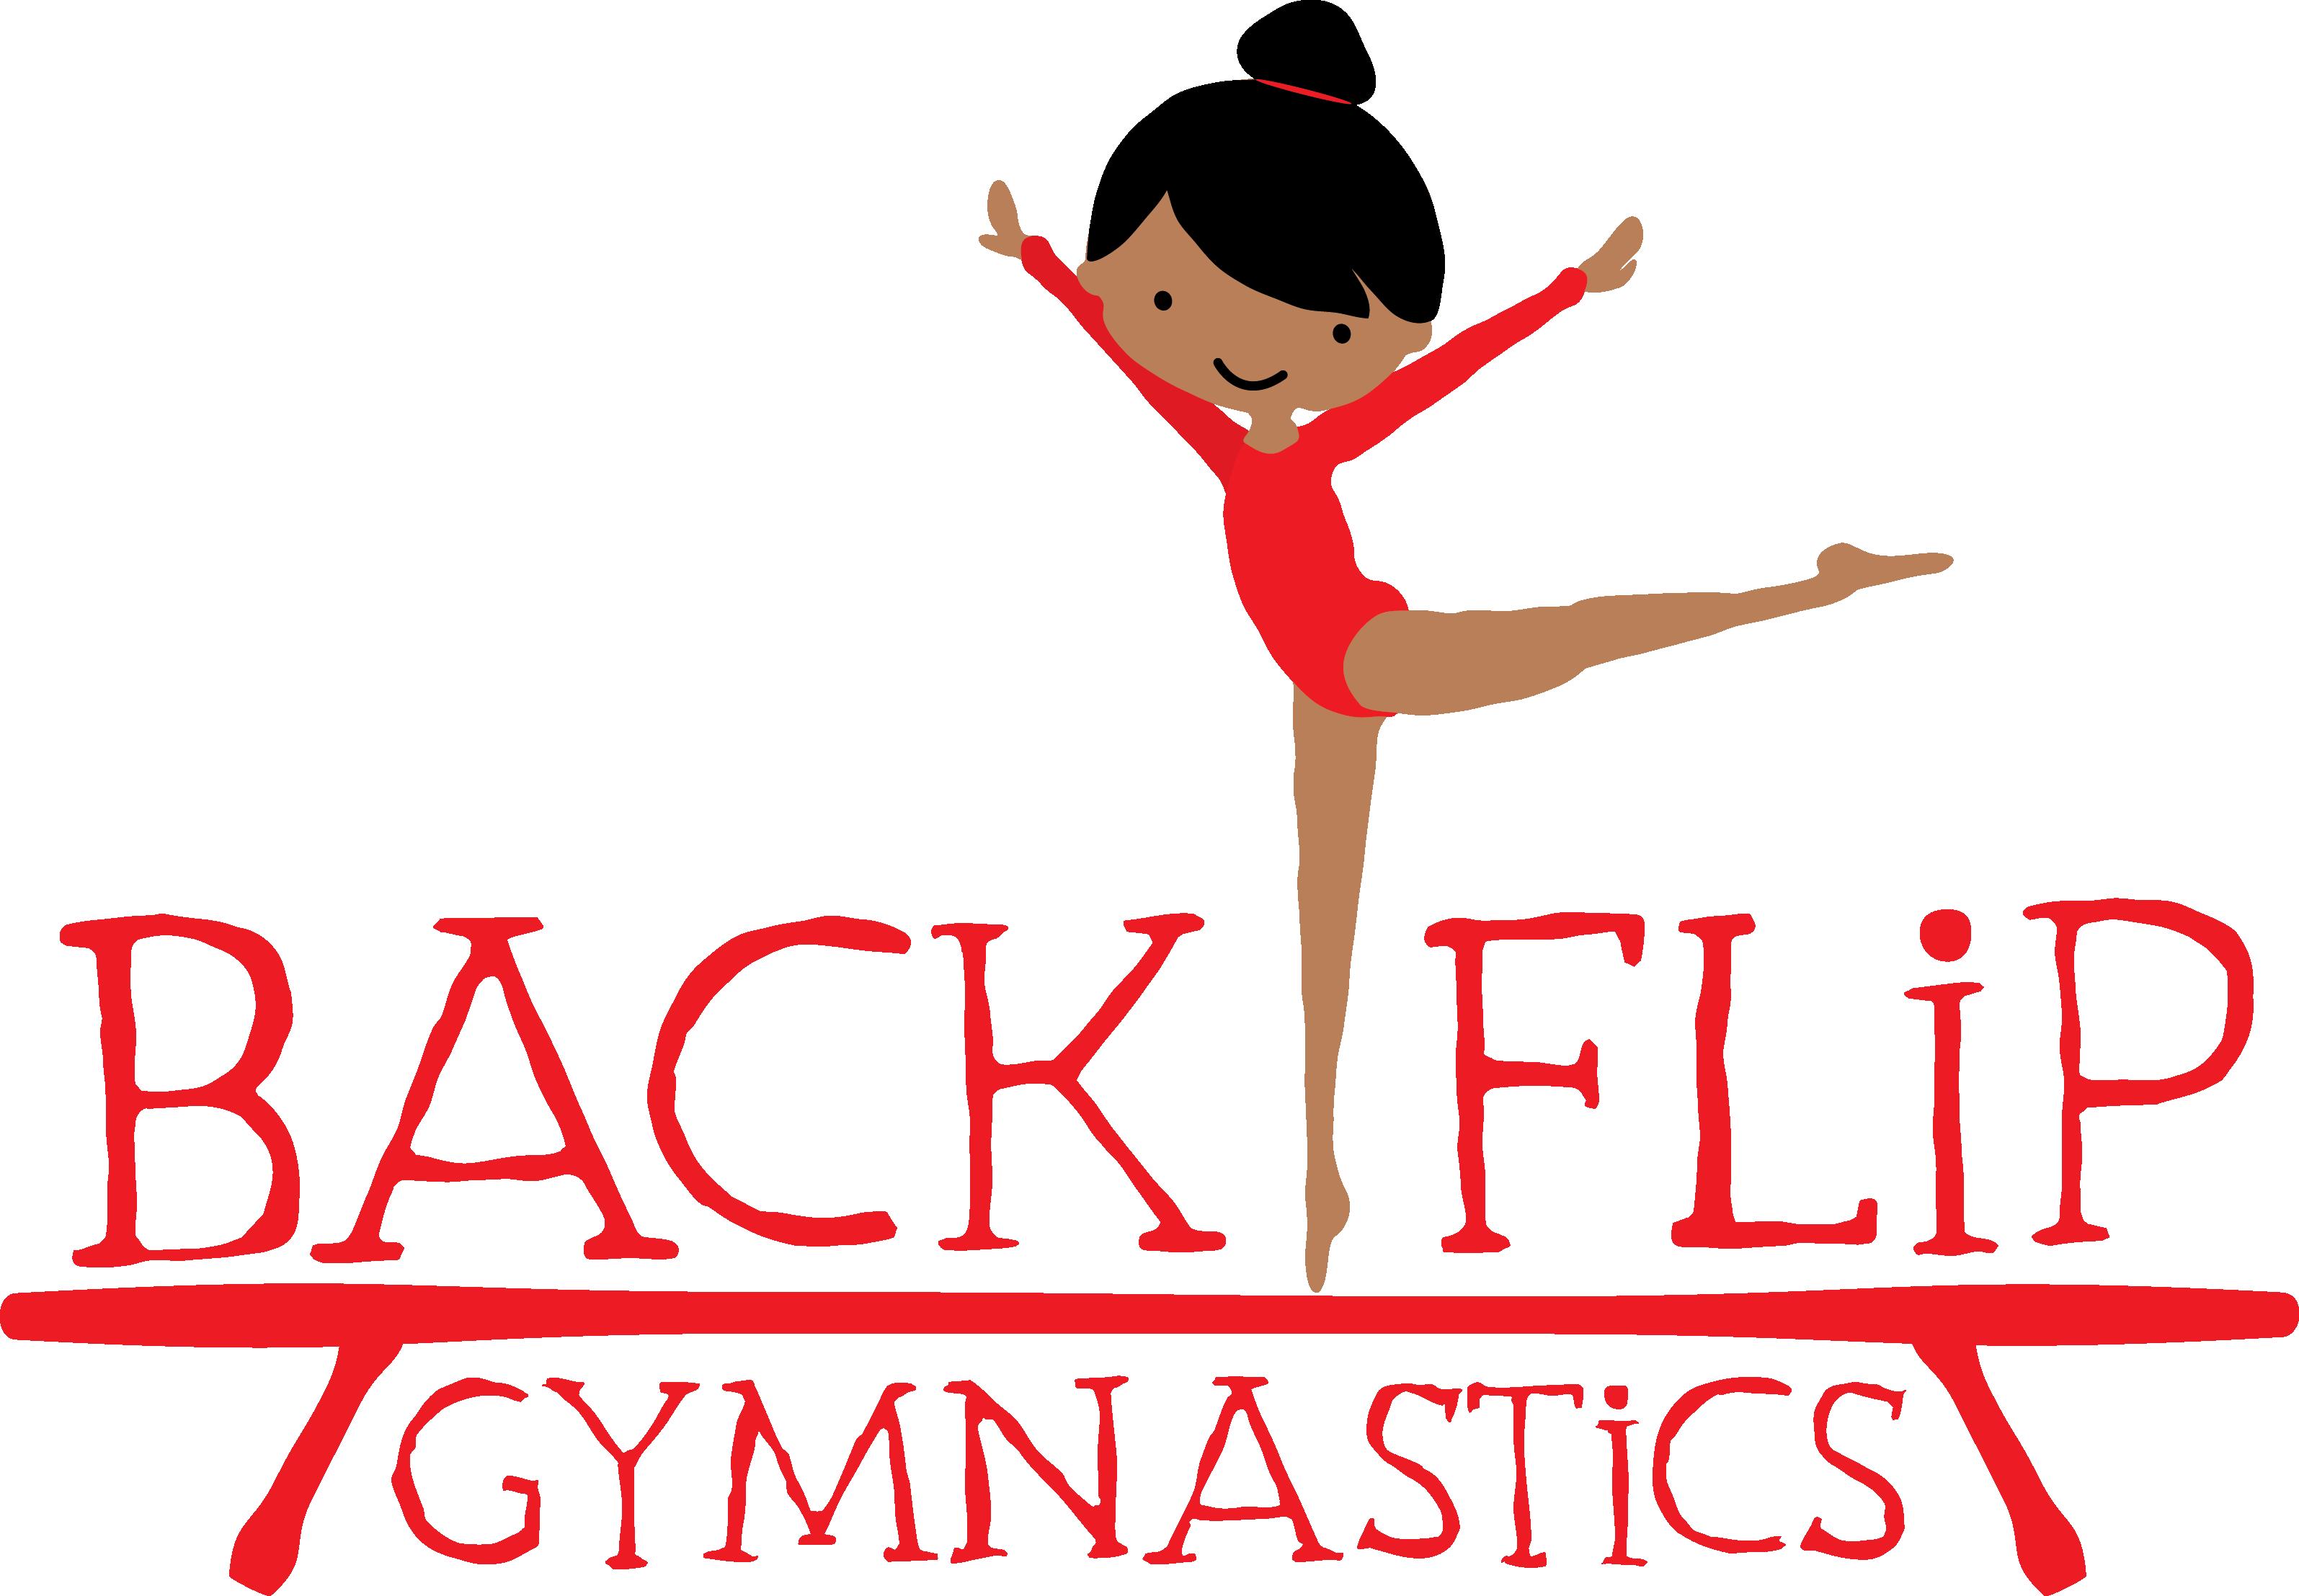 3190x2215 Gymnastics Clipart Backflip